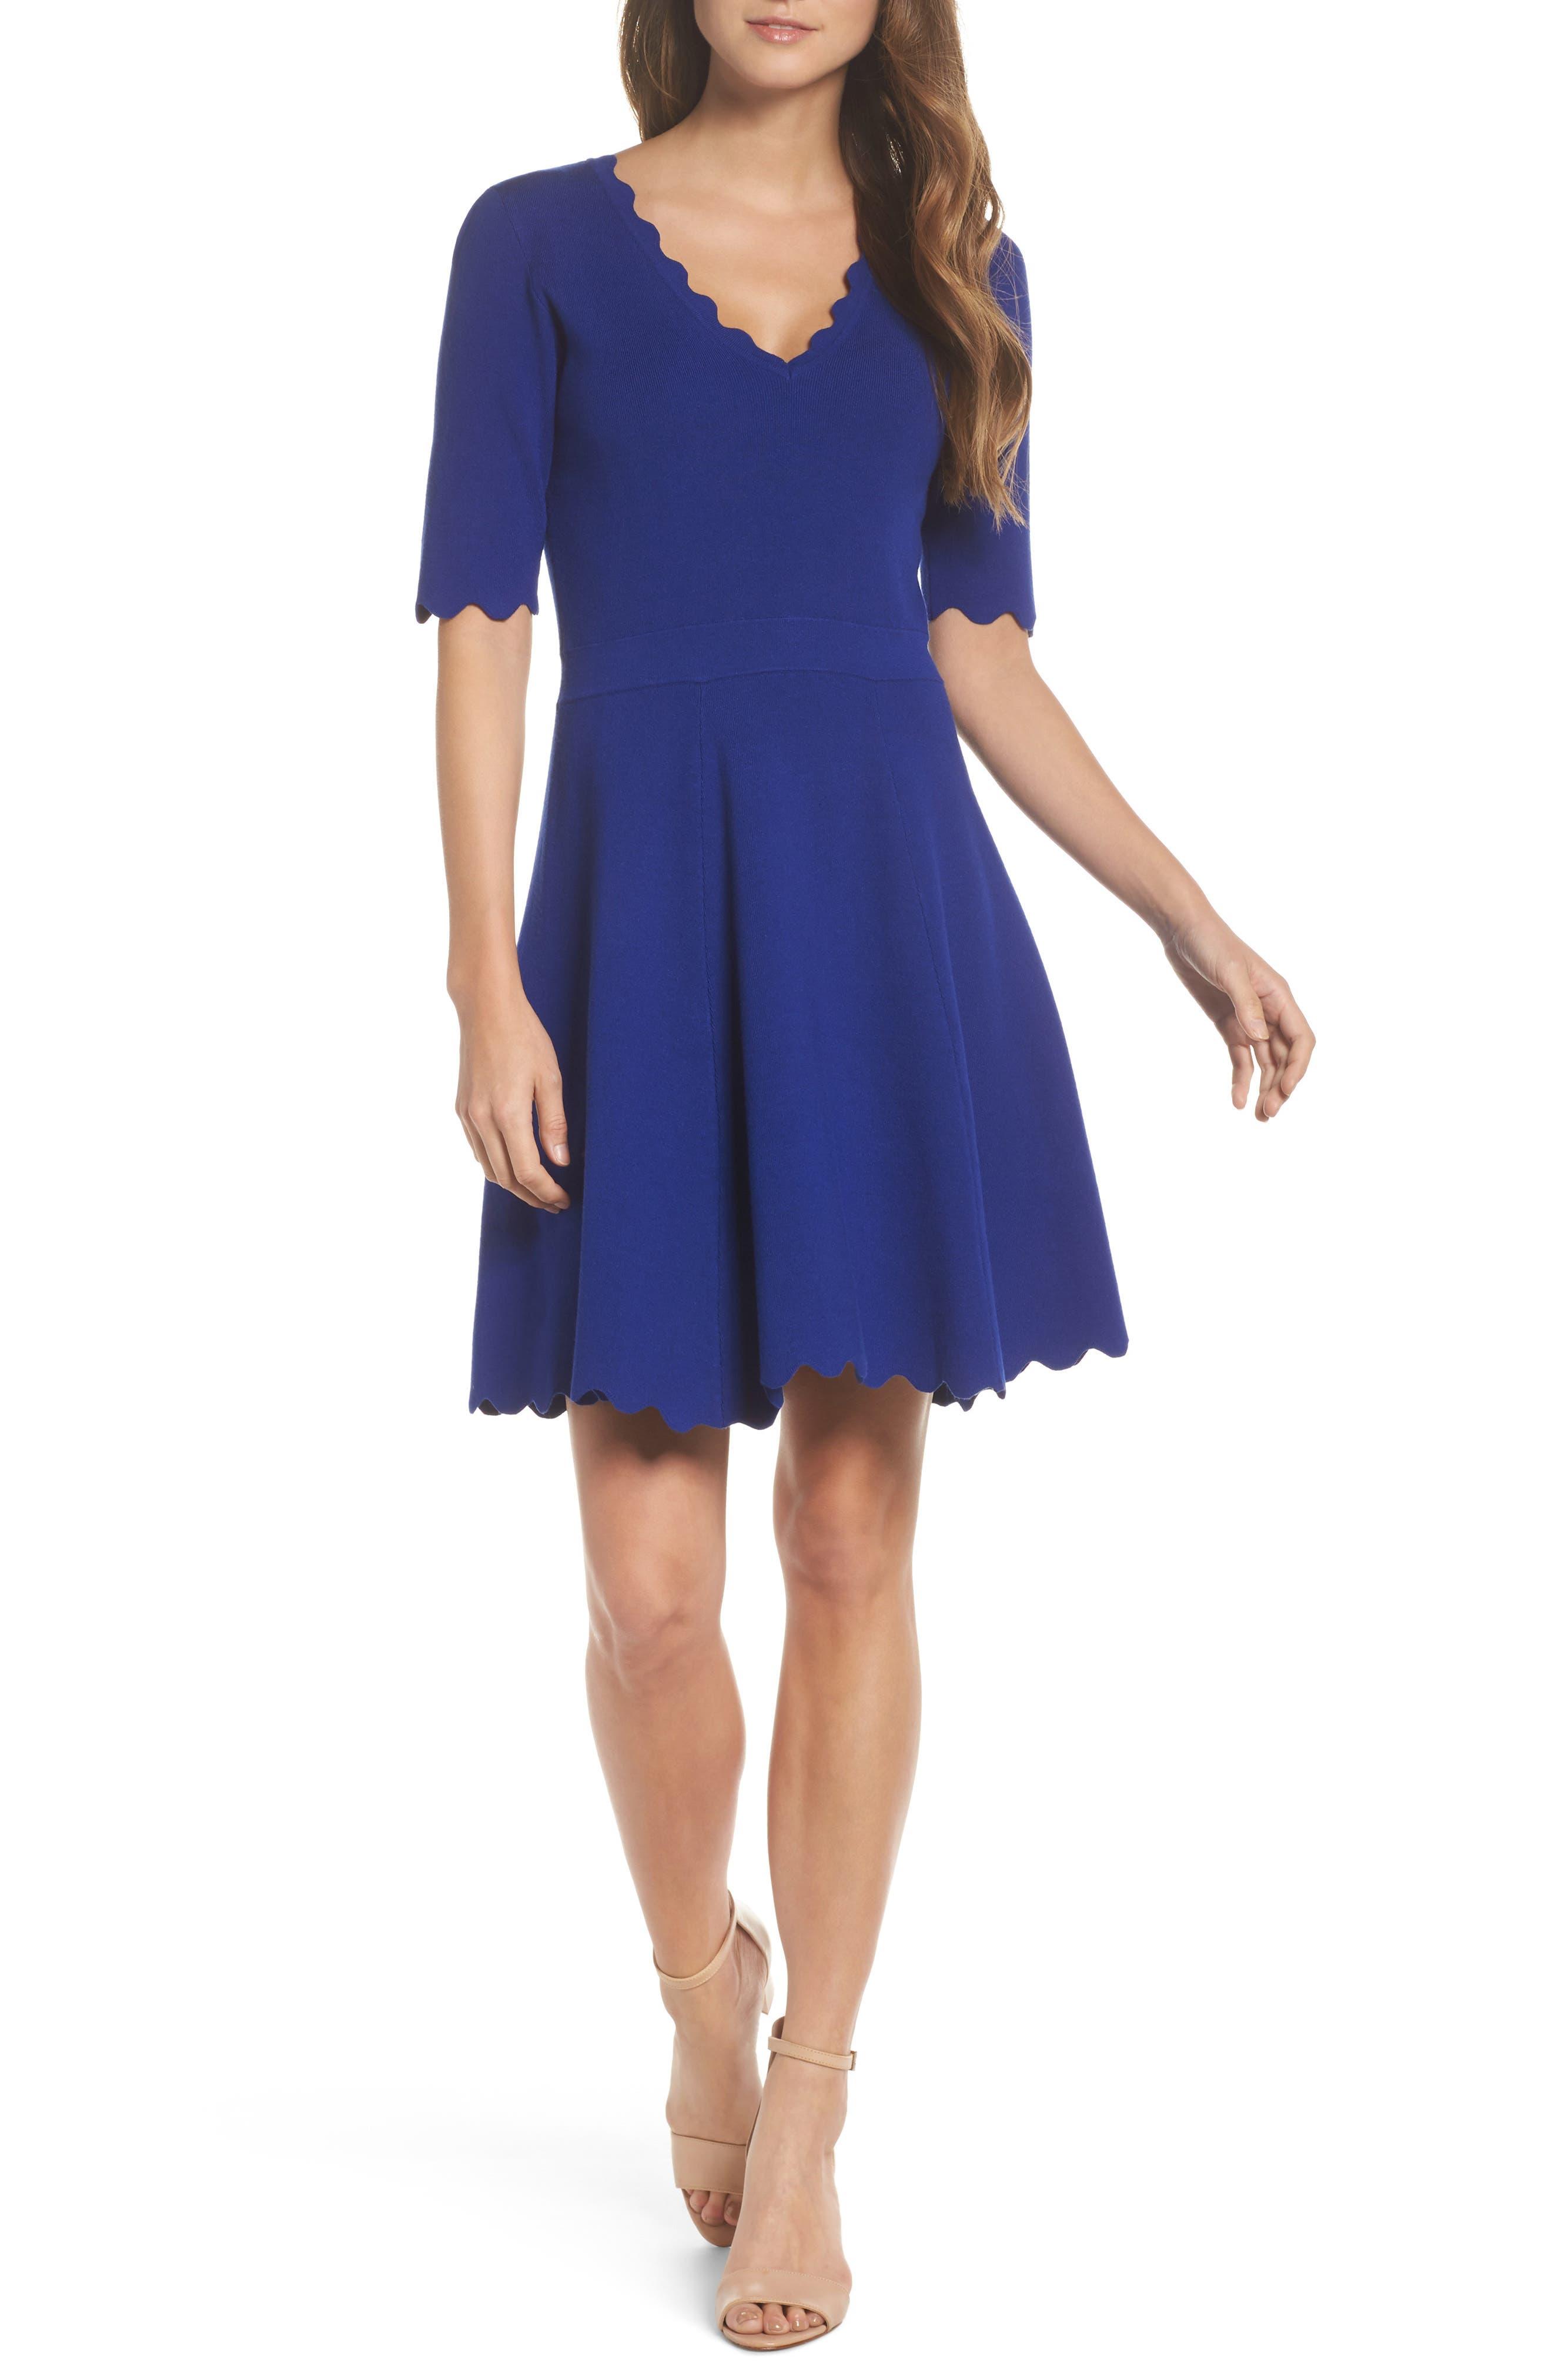 Main Image - Eliza J Scallop Fit & Flare Dress